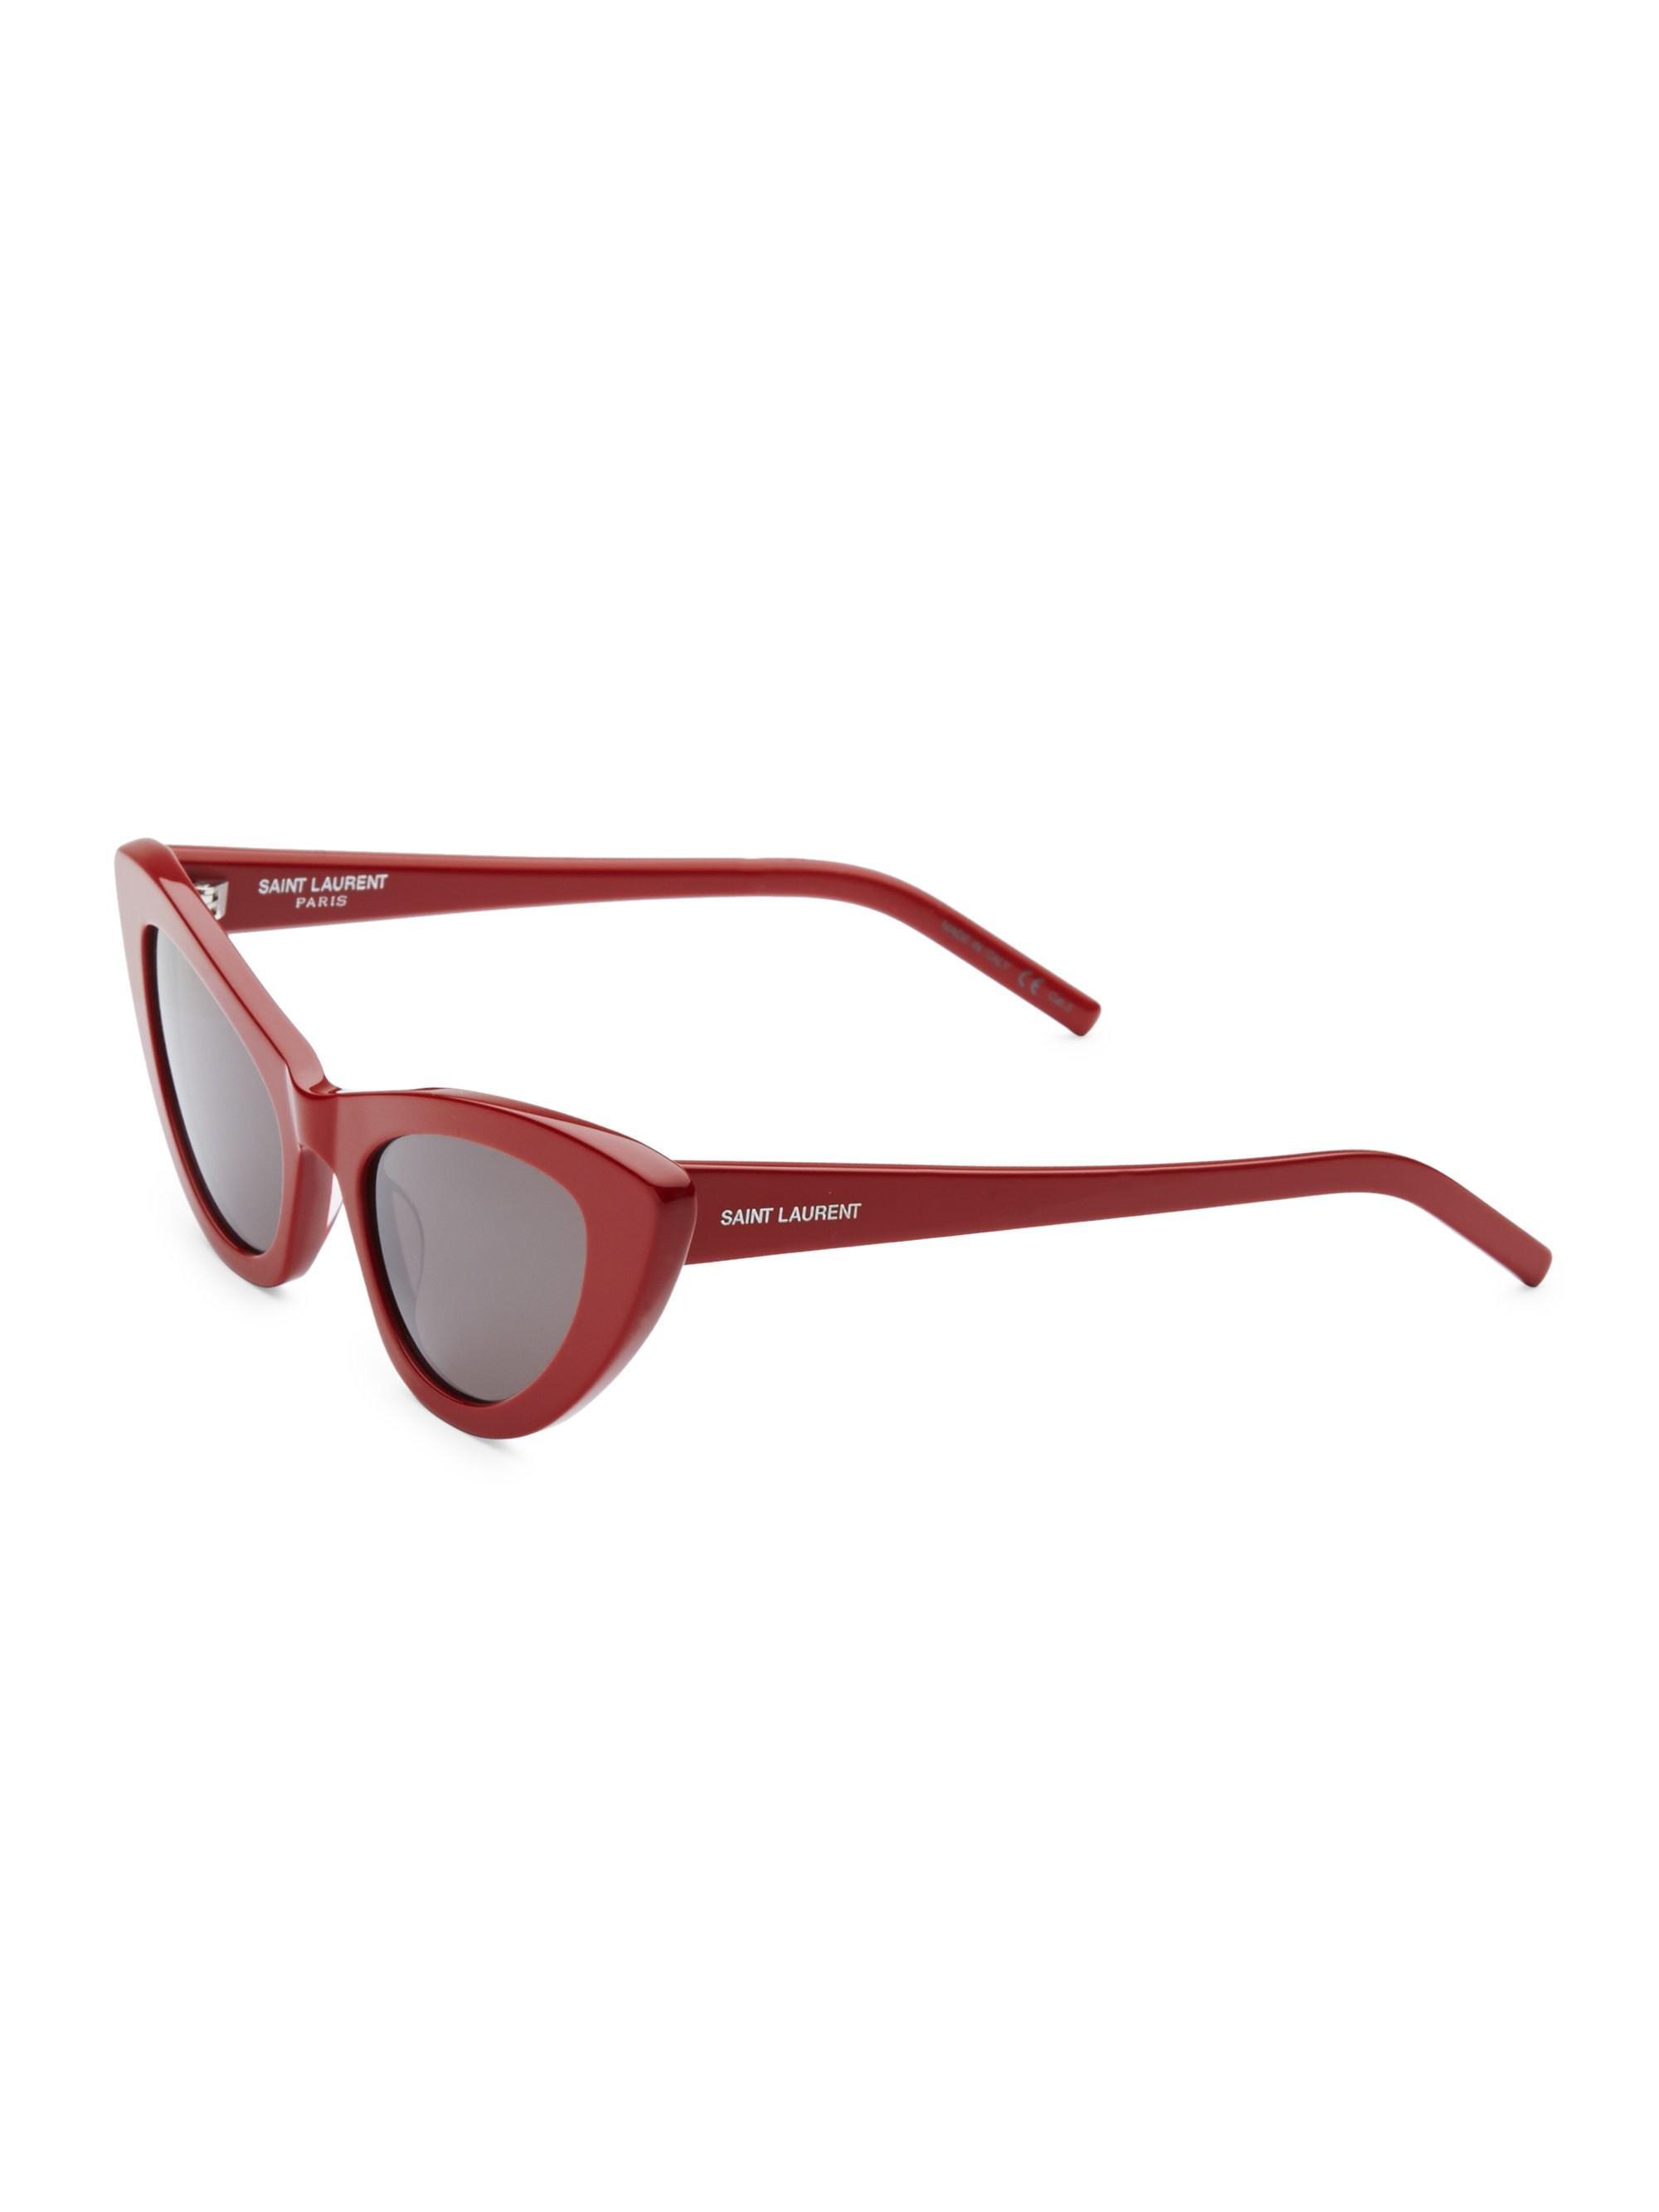 dae6e64c4c Saint Laurent - Women s 52mm Red New Wave 213 Lily Sunglasses - Red - Lyst.  View fullscreen